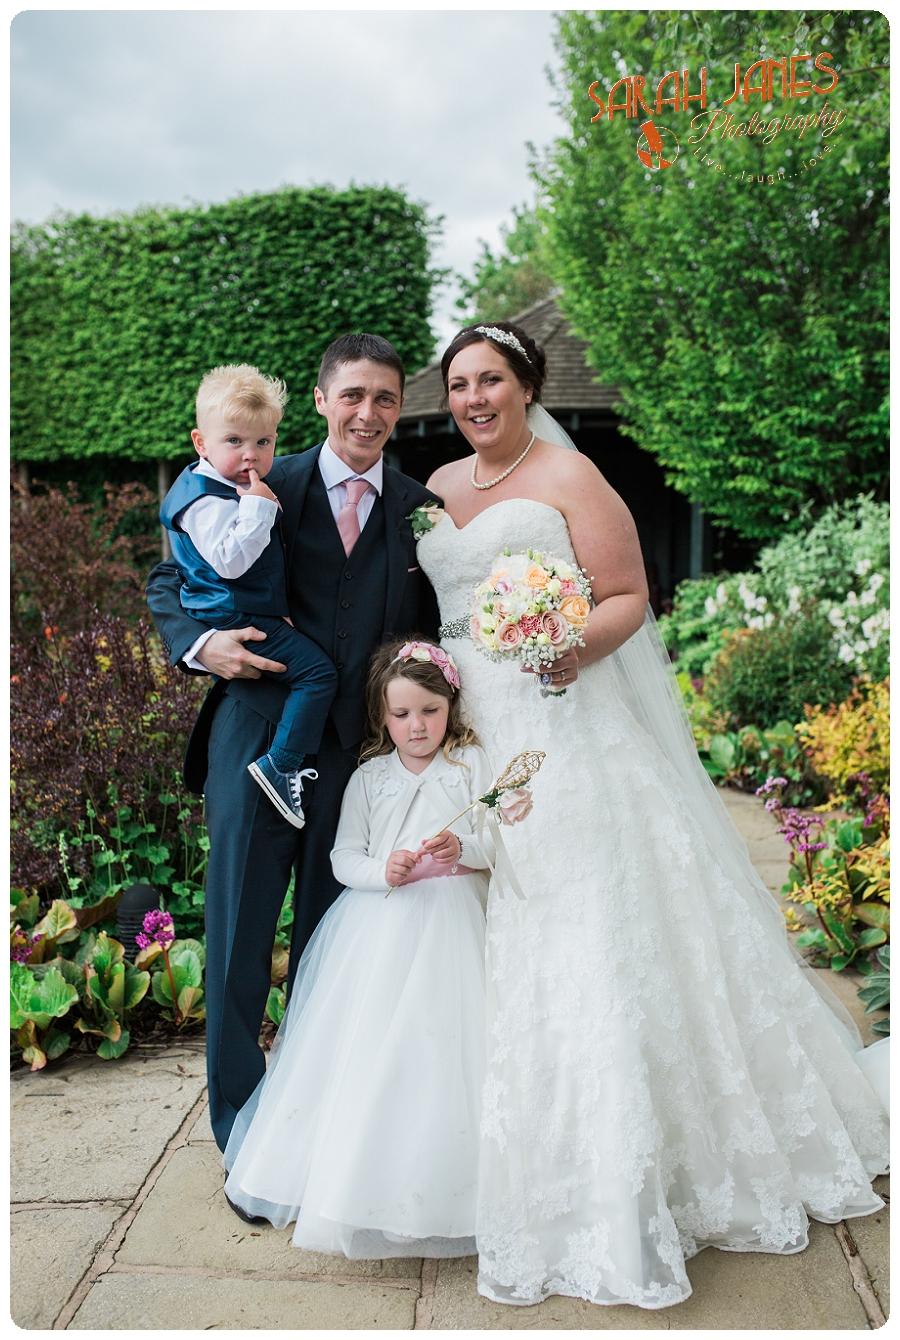 Sarah Janes Photography, Wedding Photography Lion Quays, lion quays wedding, Shropshire wedding photograper_0028.jpg